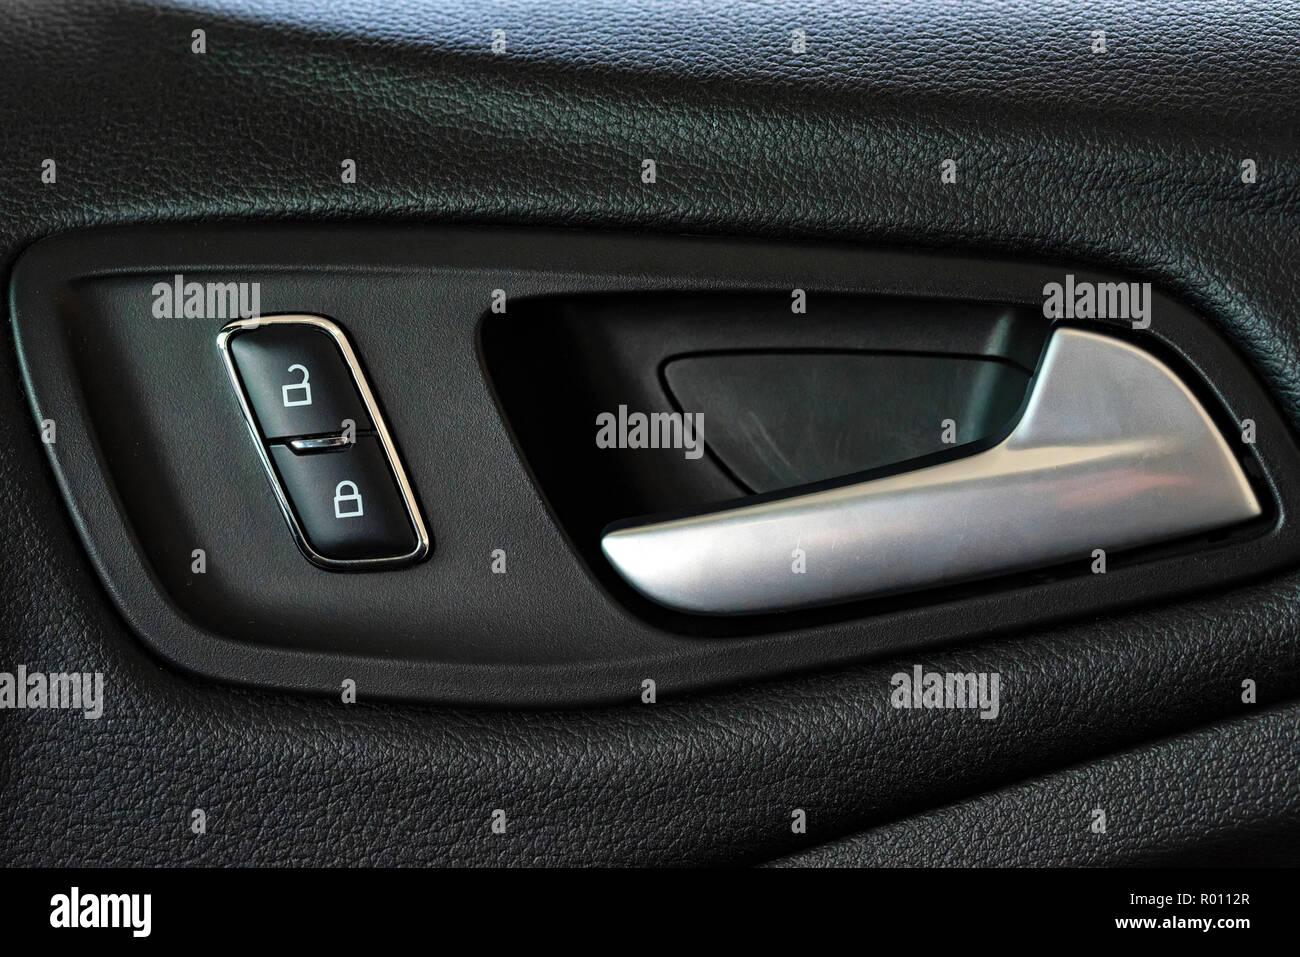 Inside car door handle Interior Car Modern Plastic Car Door Handle From Inside Close Alamy Modern Plastic Car Door Handle From Inside Close Stock Photo